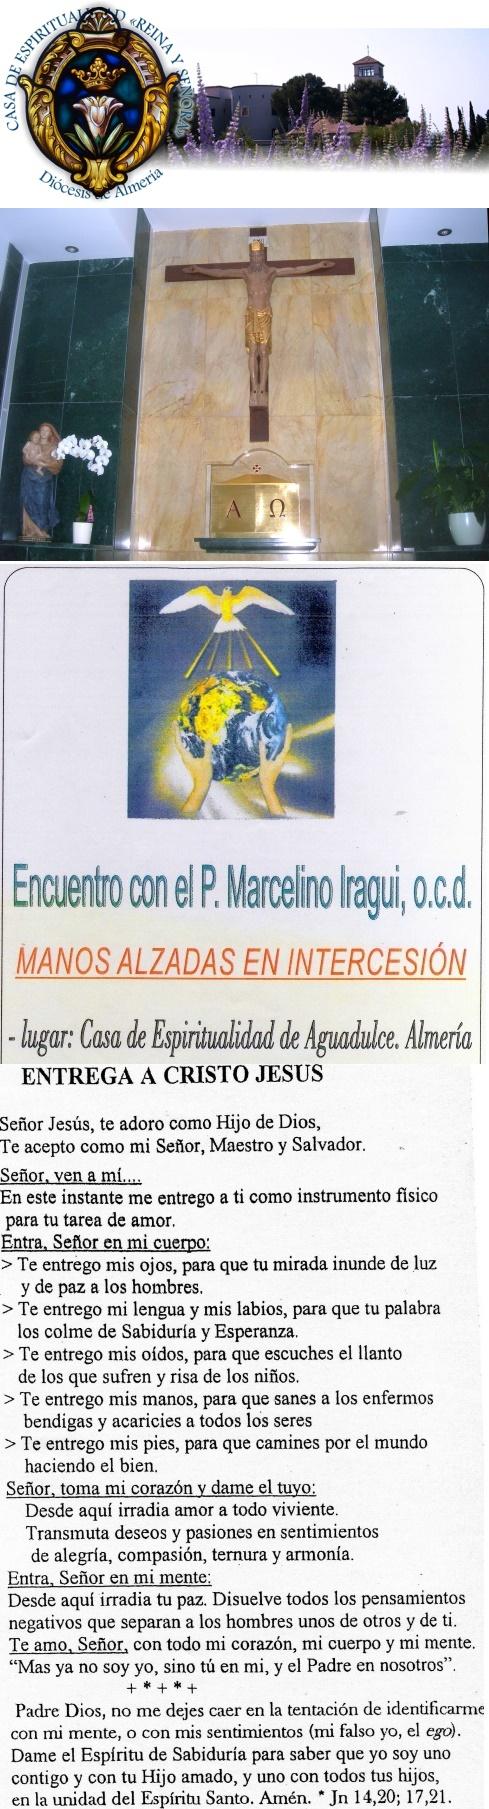 20150517063830-ma-entrega-a-jesus.jpg